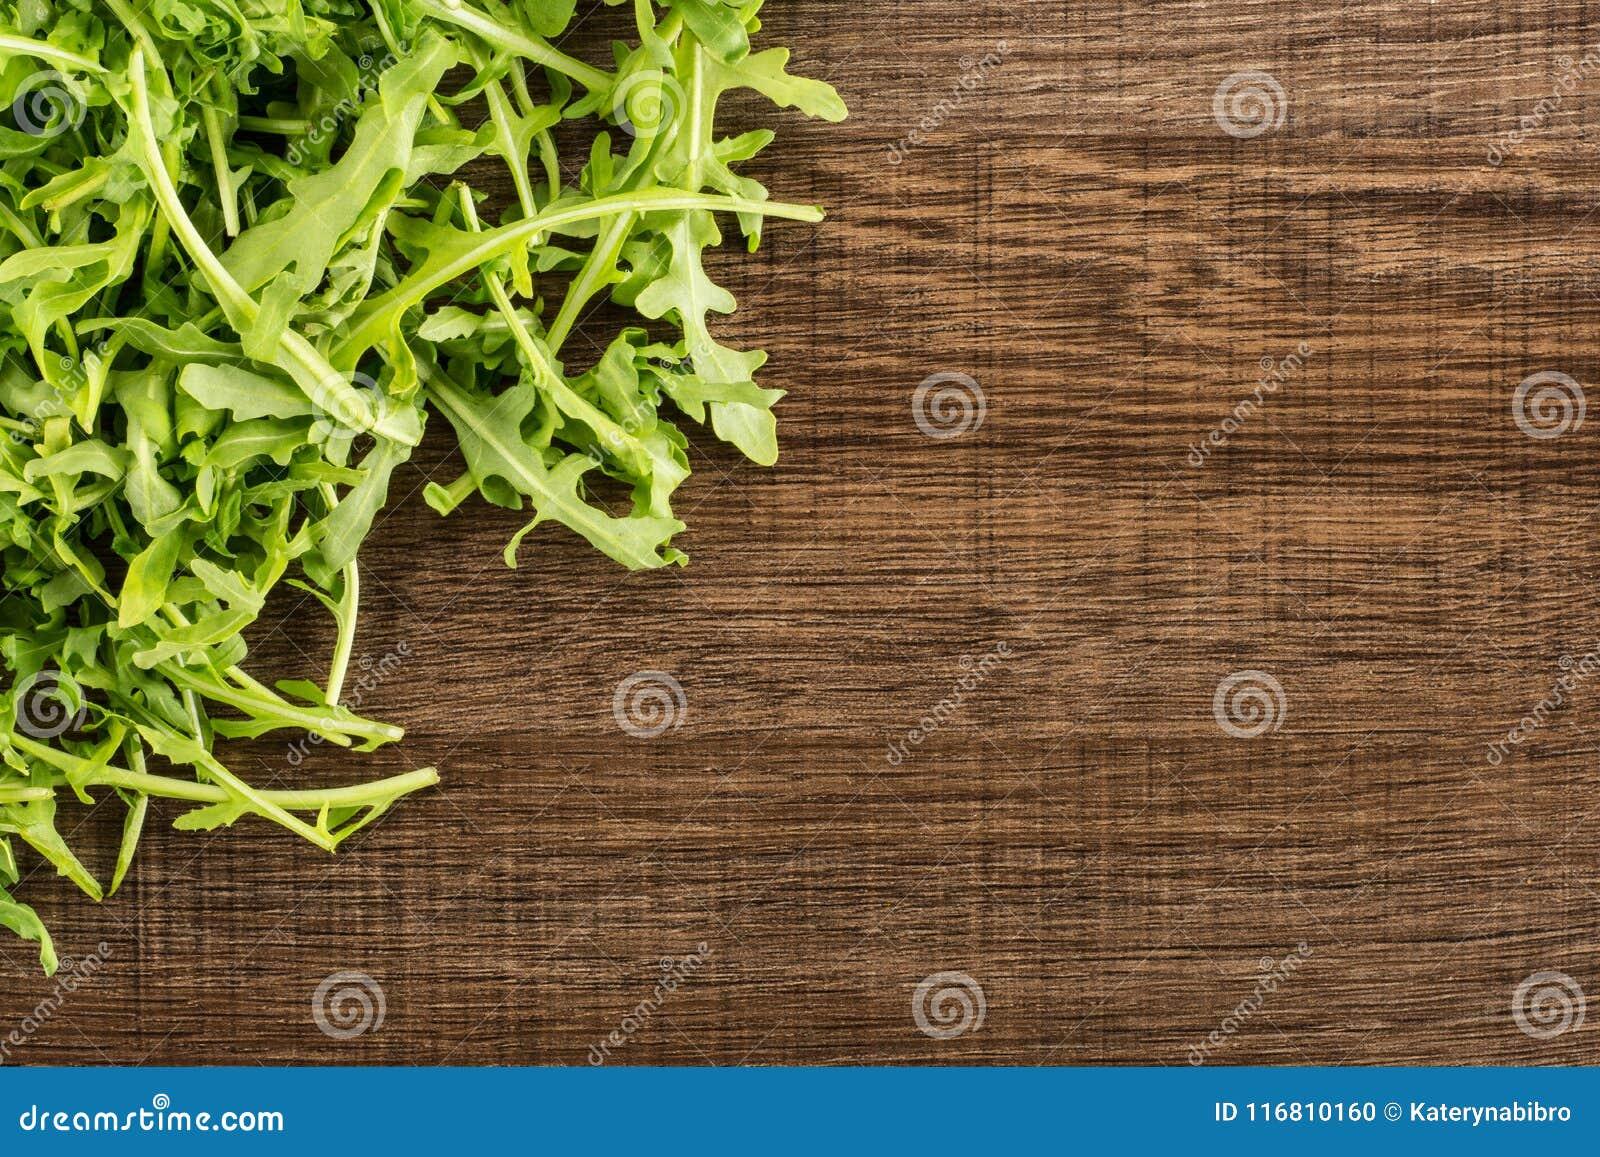 Rucola cruda fresca Rucola su legno marrone